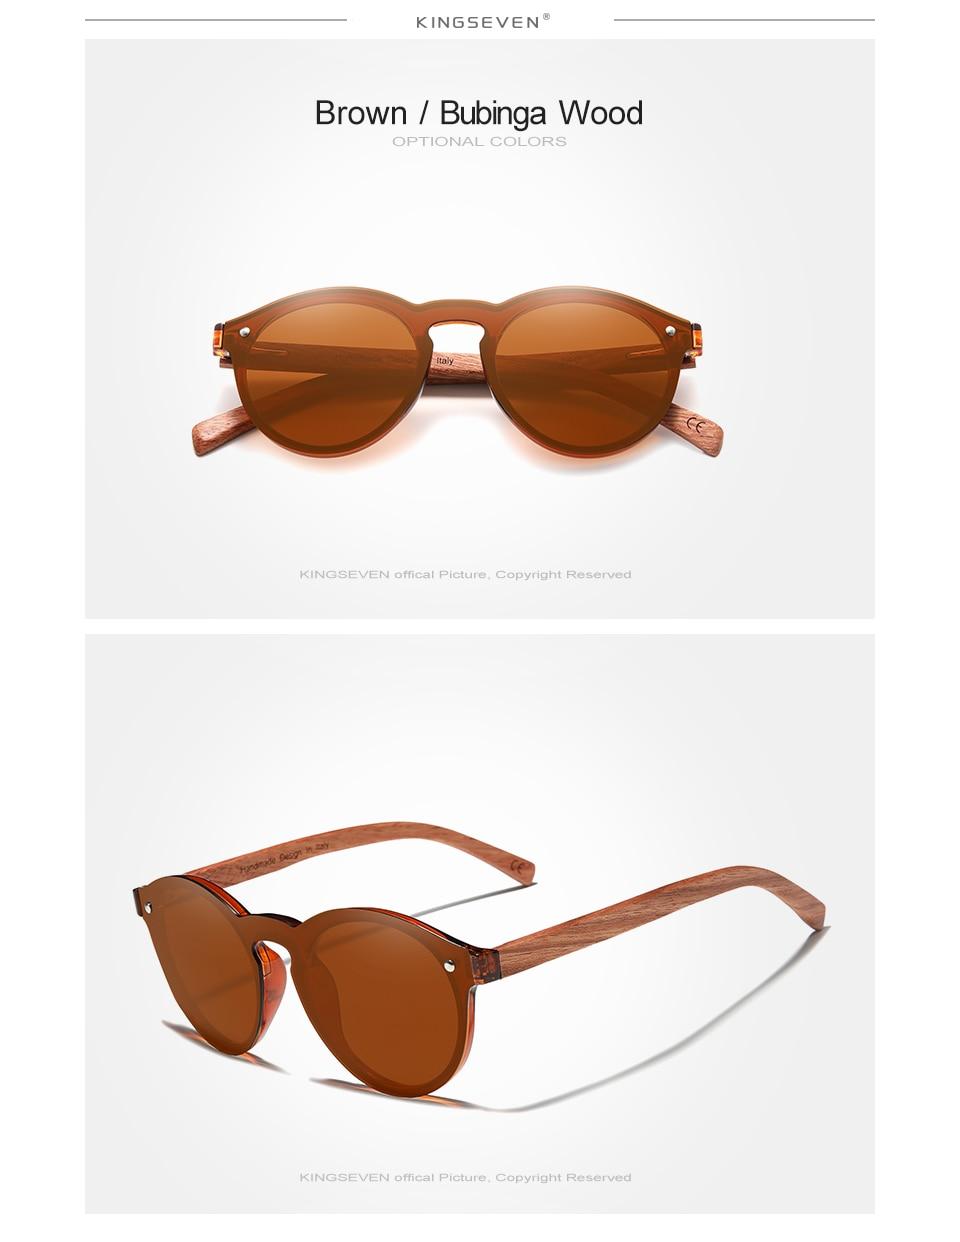 Hb82ecf1ff70749f28f3529c60d2cbb4f1 Custom LOGO Natural Wooden Sunglasses GIFTINGER Bubinga Men's Polarized Glasses Wooden Fashion Sun Glasses Original Accessories